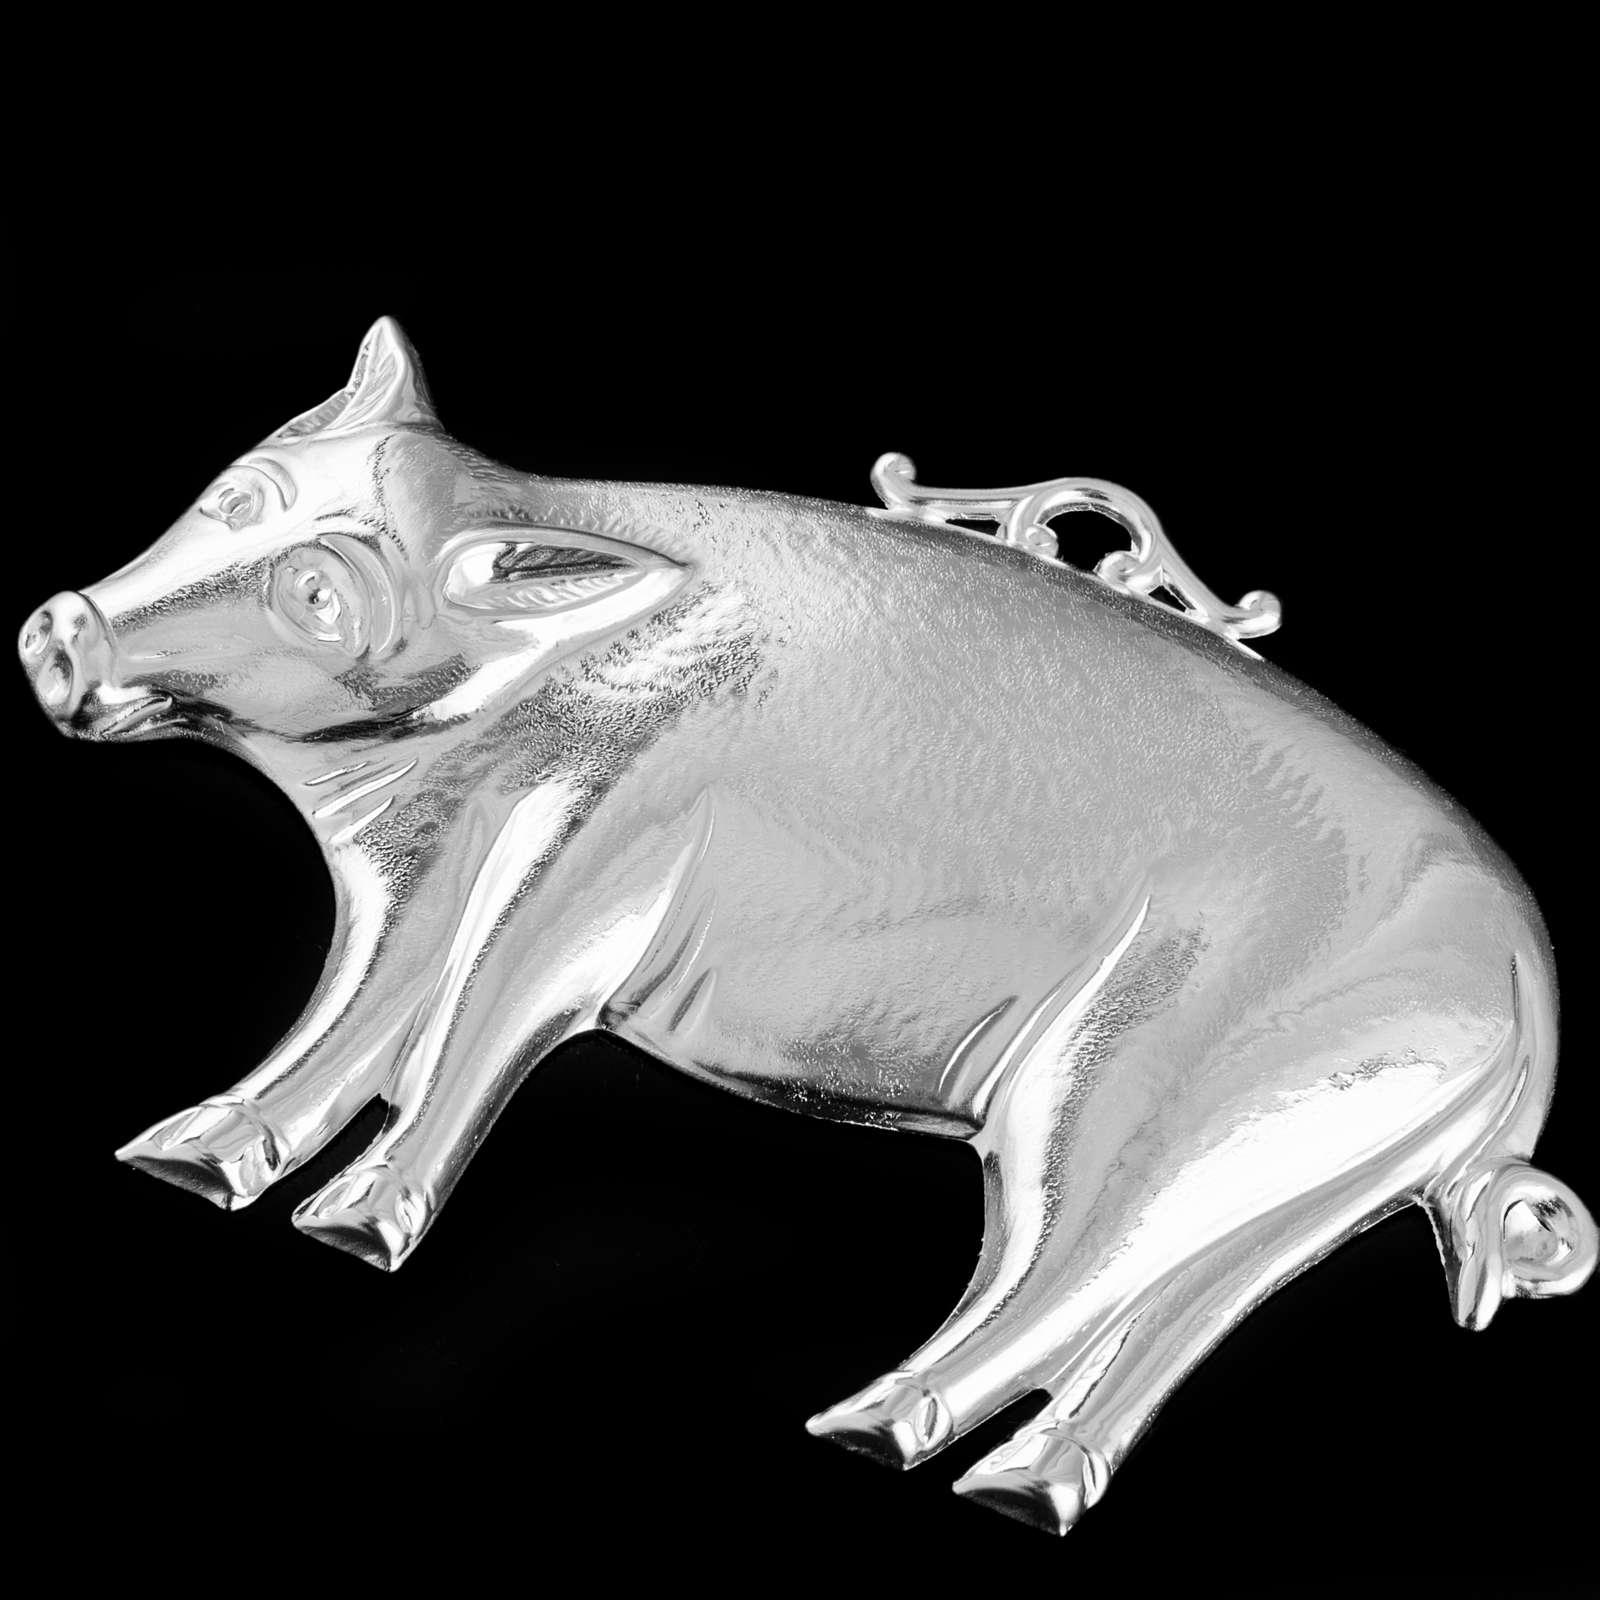 Ex-voto porco prata 925 ou metal 10x6 cm 3